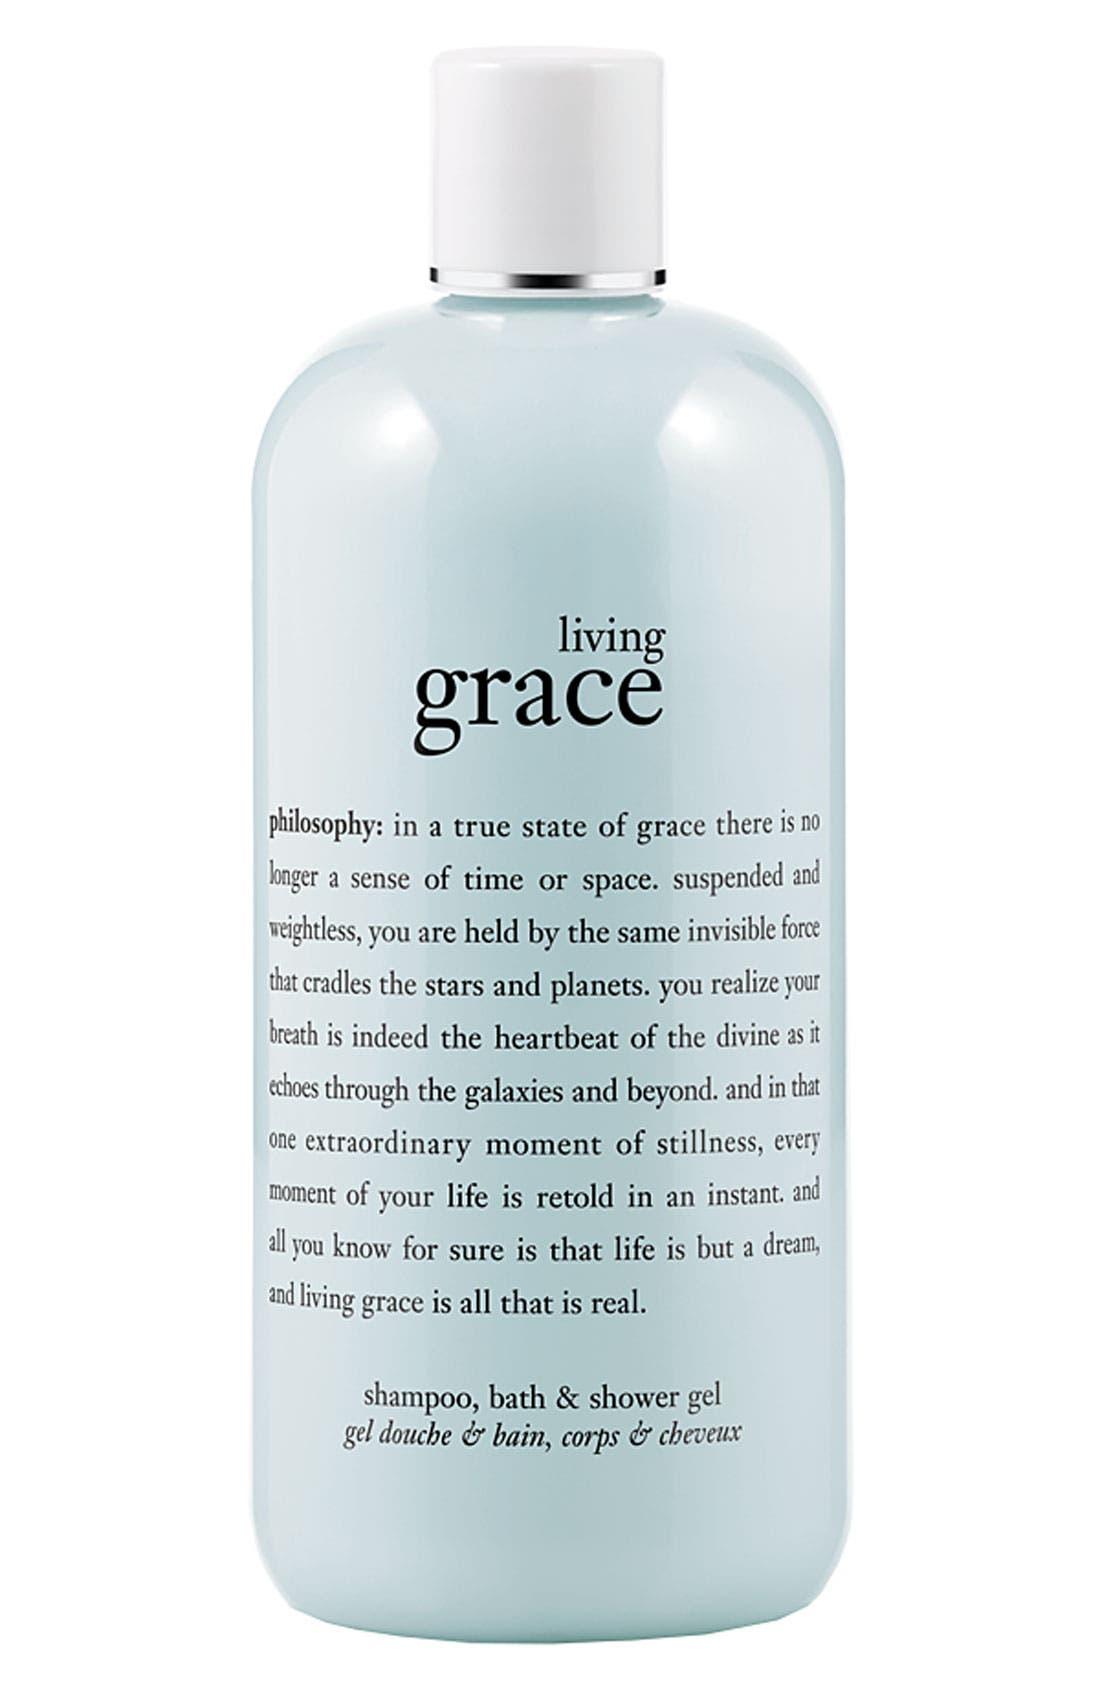 philosophy 'living grace' shampoo, bath & shower gel